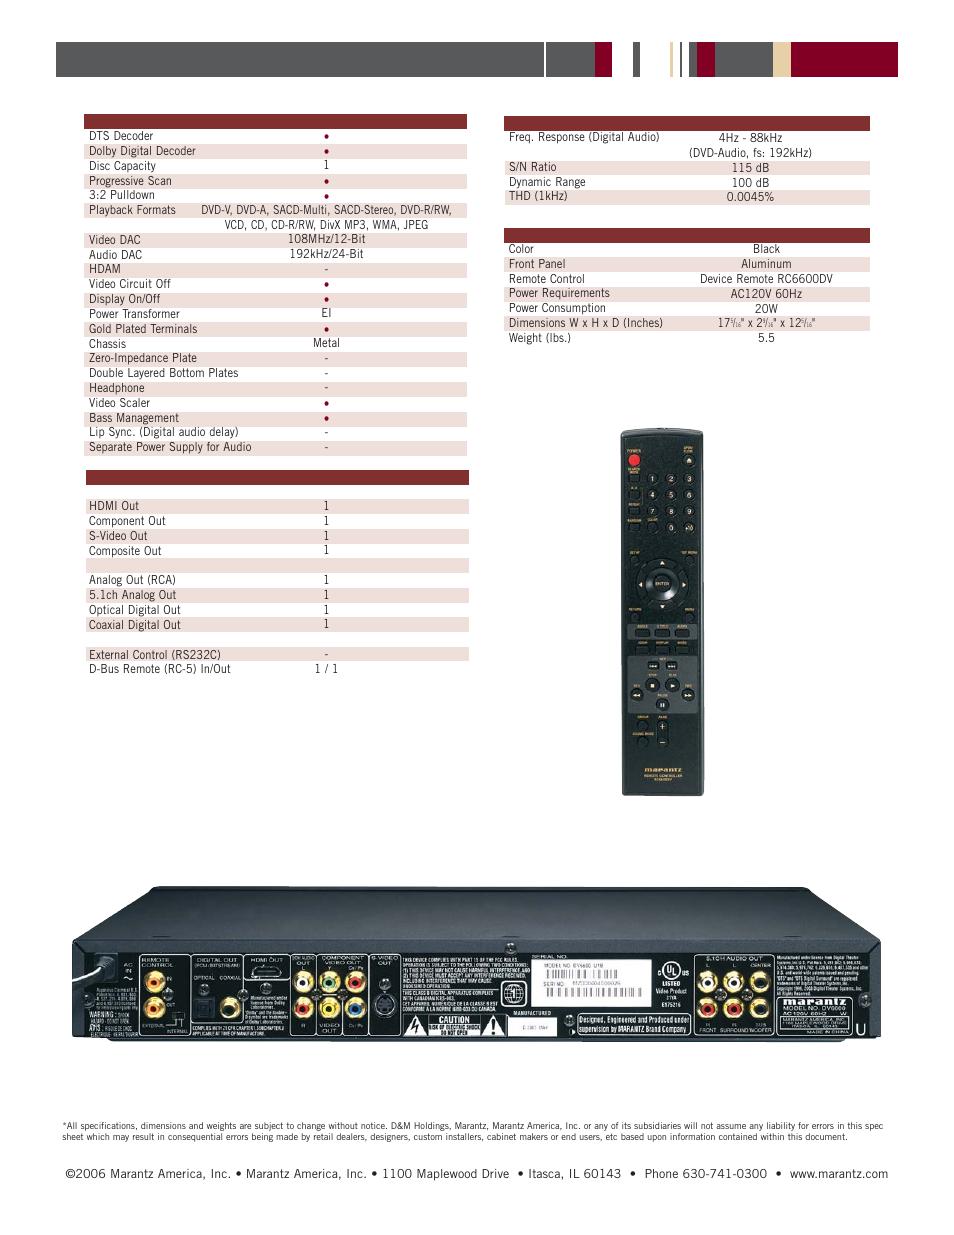 dv6600 marantz dv6600 user manual page 2 2 original mode rh manualsdir com User Training User Manual